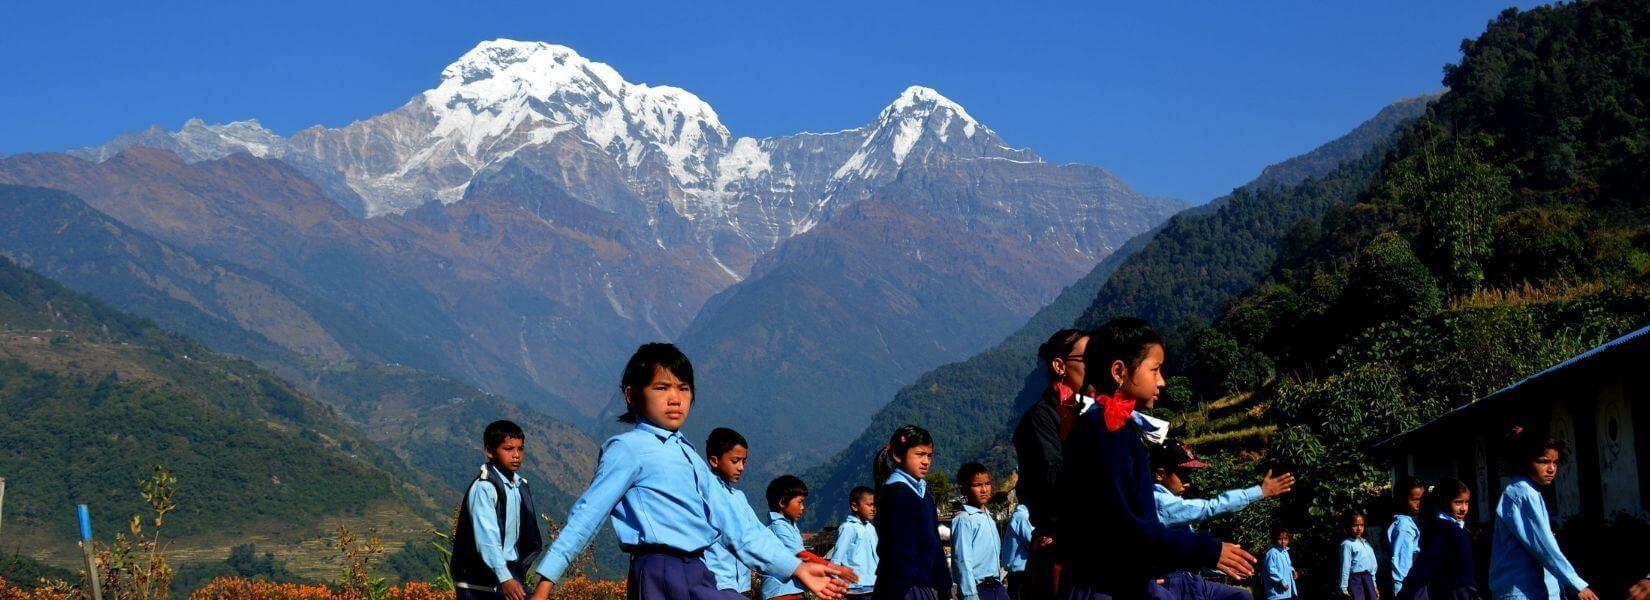 Annapurna Luxury Trek